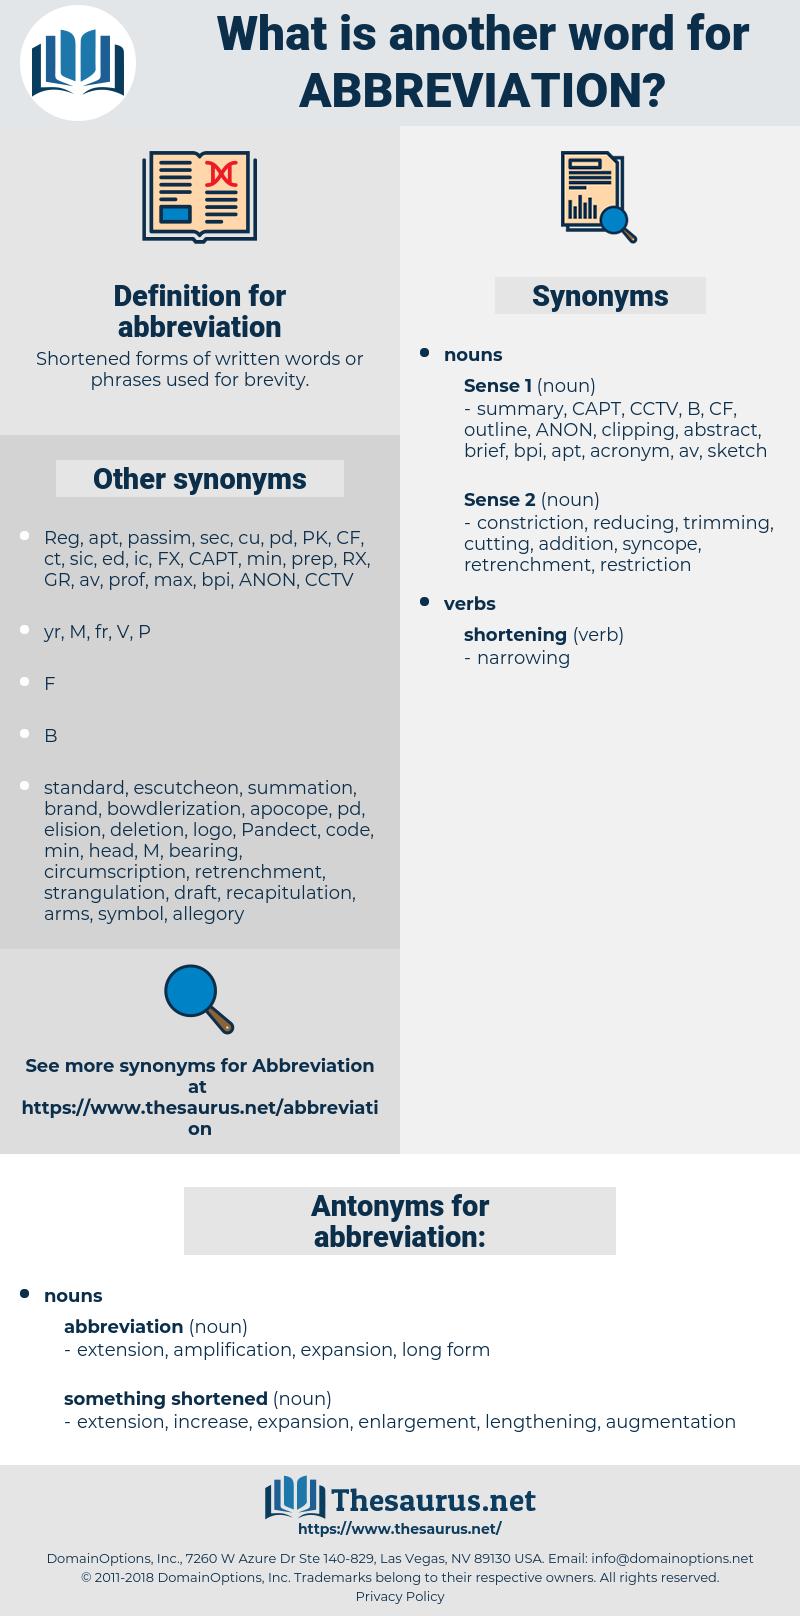 abbreviation, synonym abbreviation, another word for abbreviation, words like abbreviation, thesaurus abbreviation